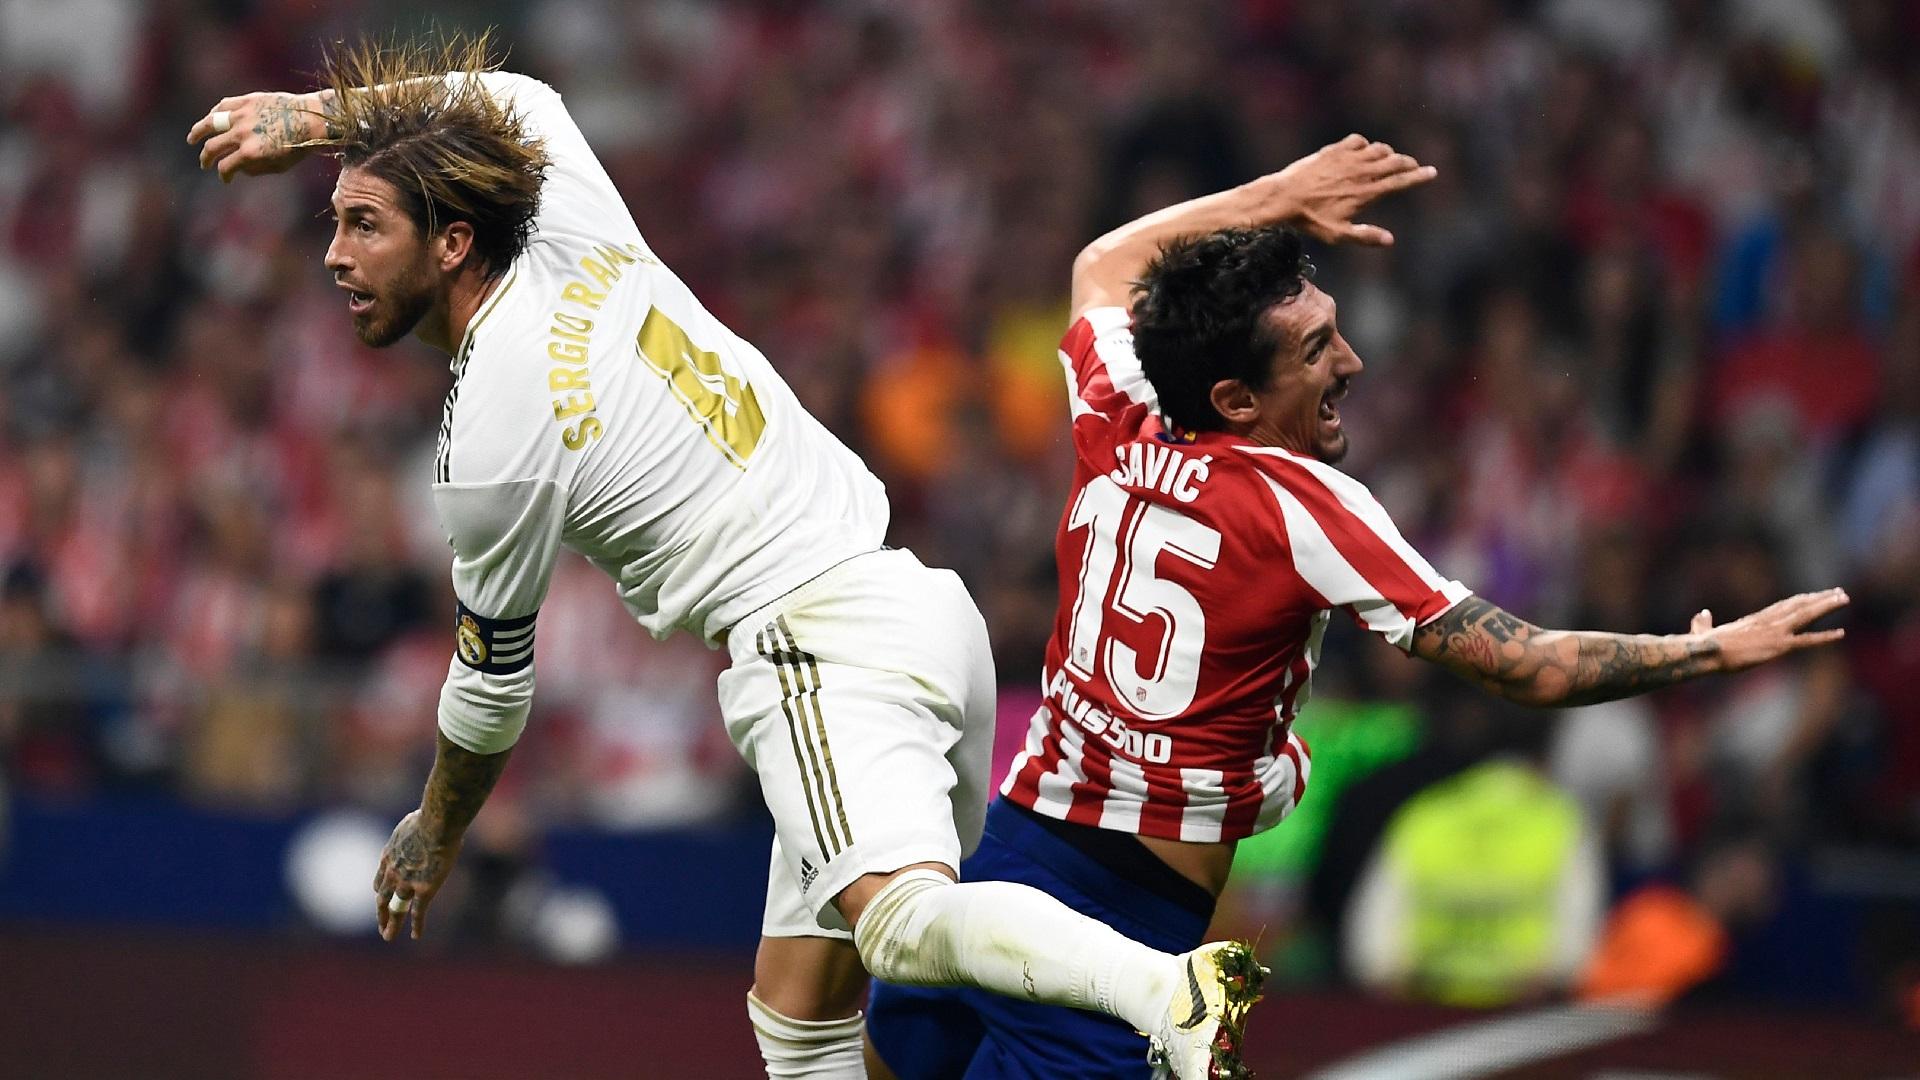 Real-Séville - Sergio Ramos finalement absent, Karim Benzema présent